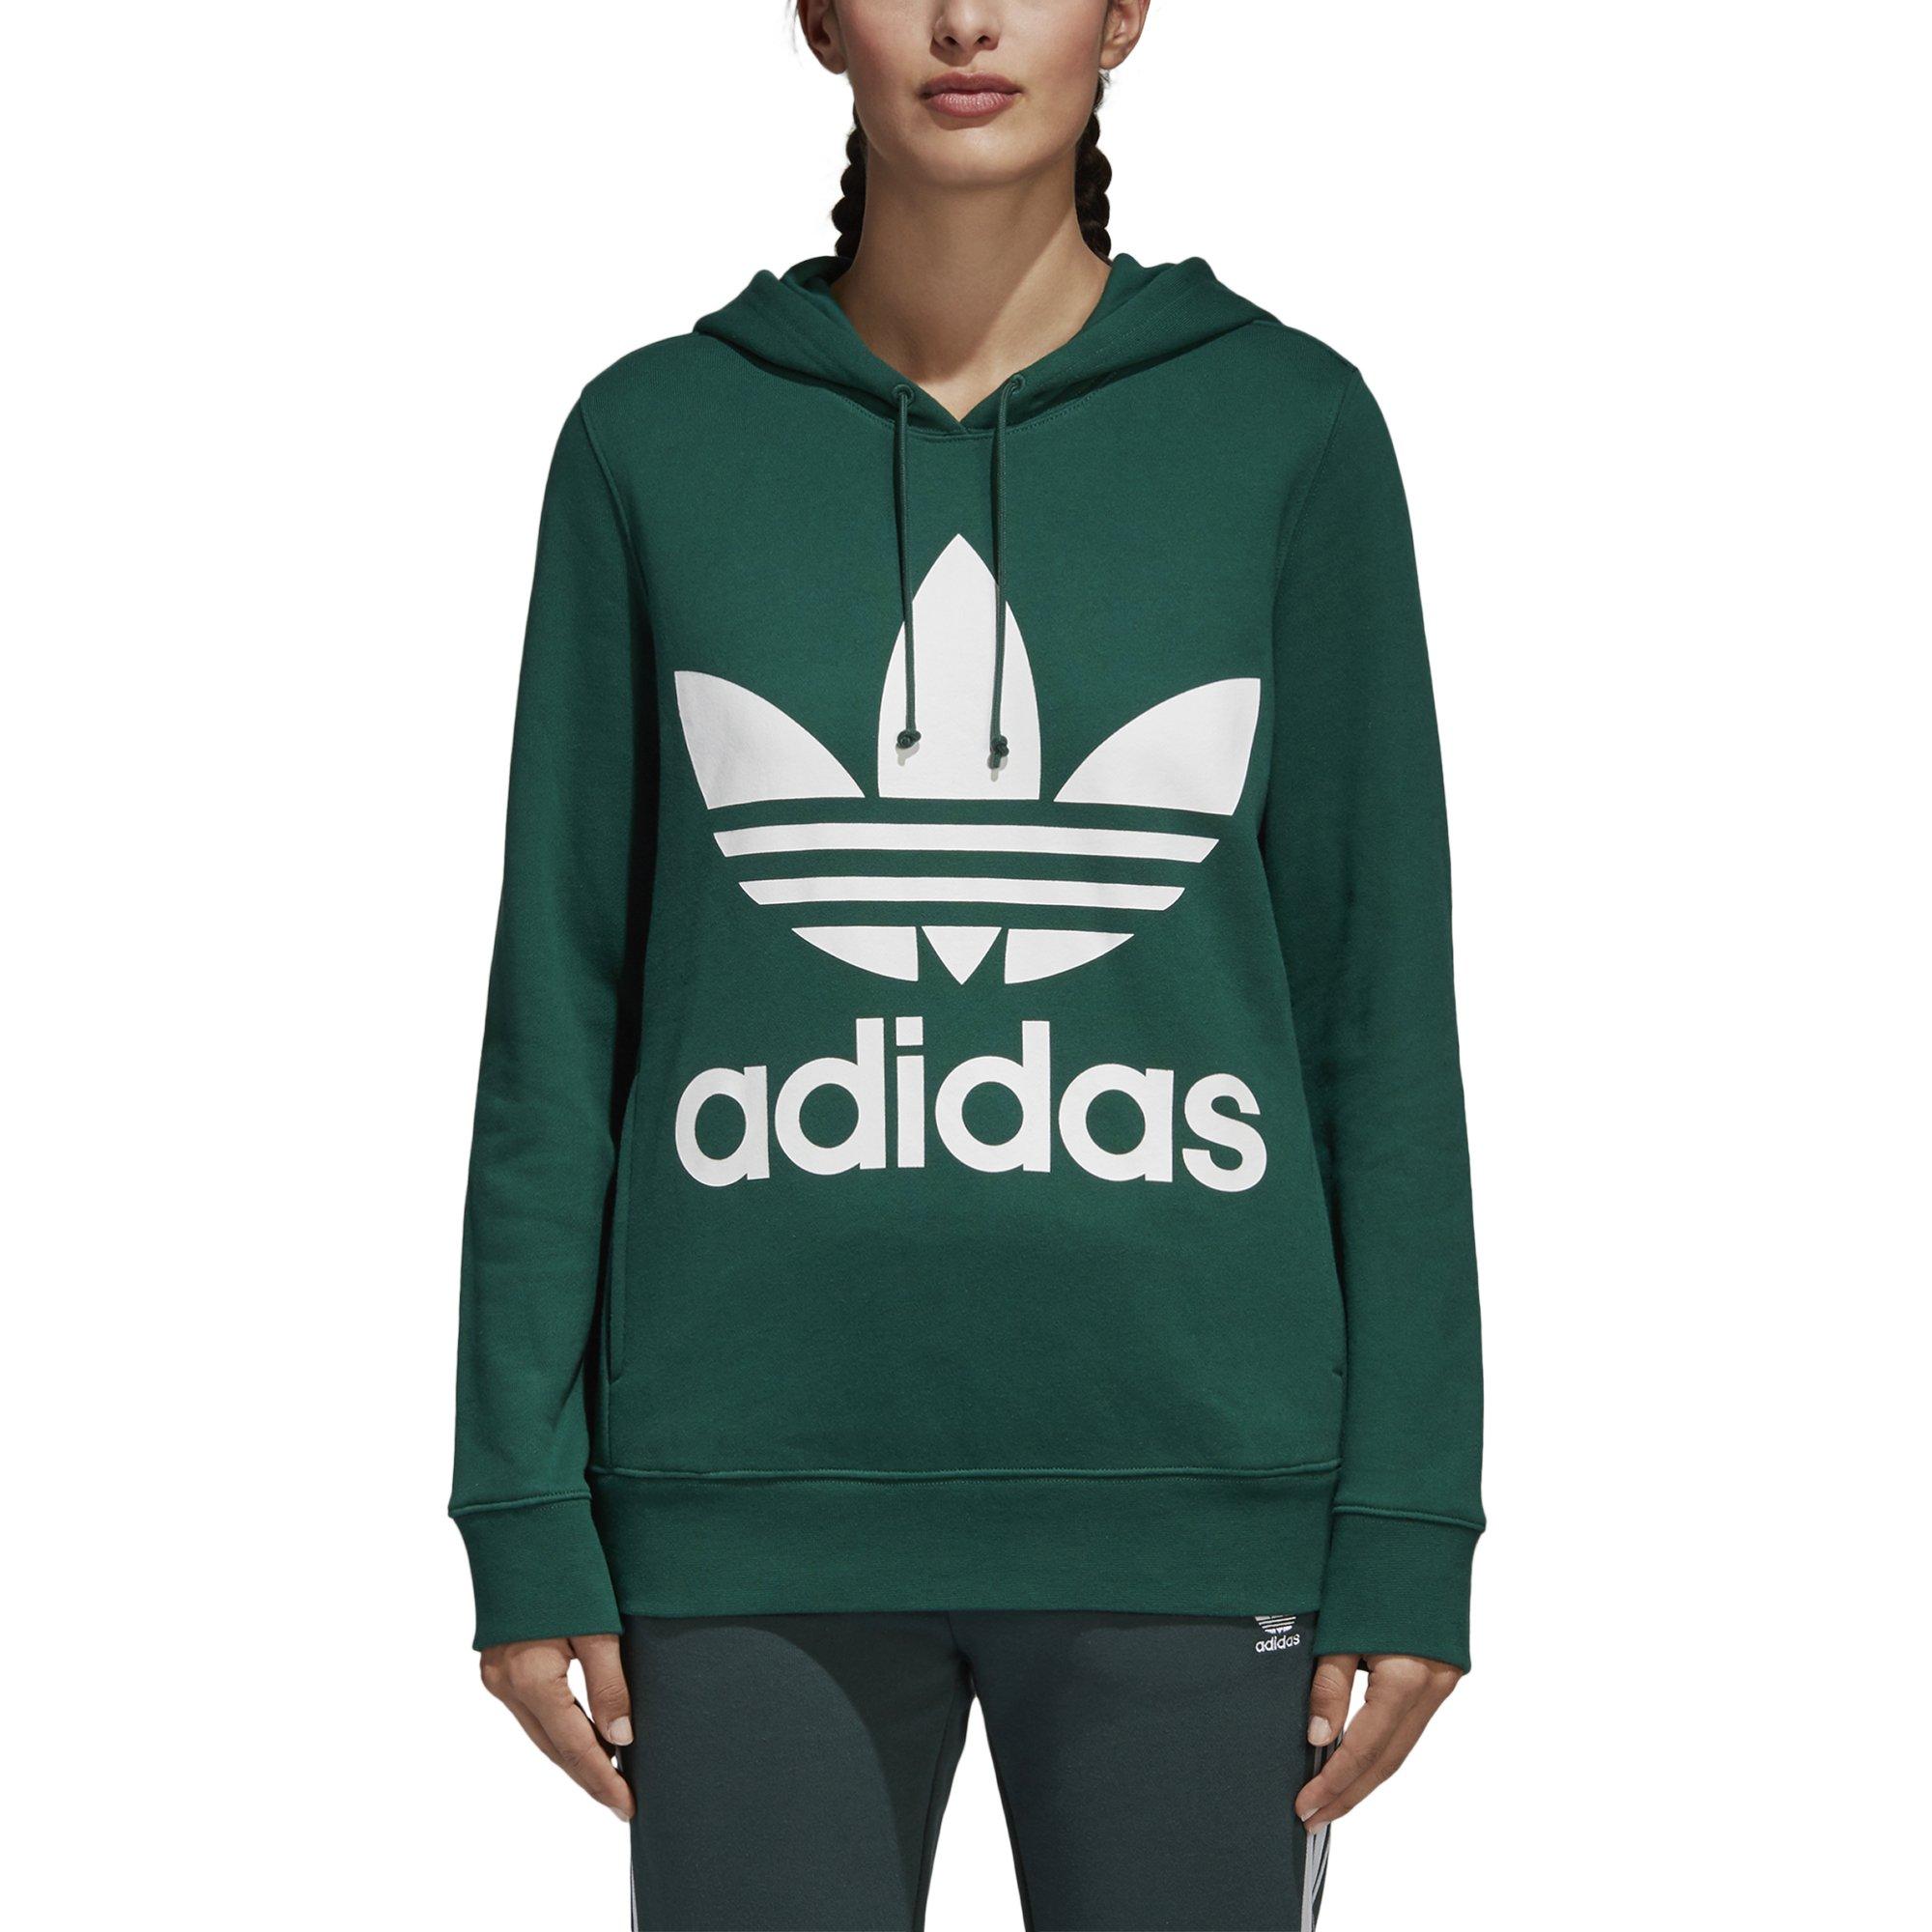 Galleon - Adidas Originals Women s Trefoil Hoodie f4743ccb70